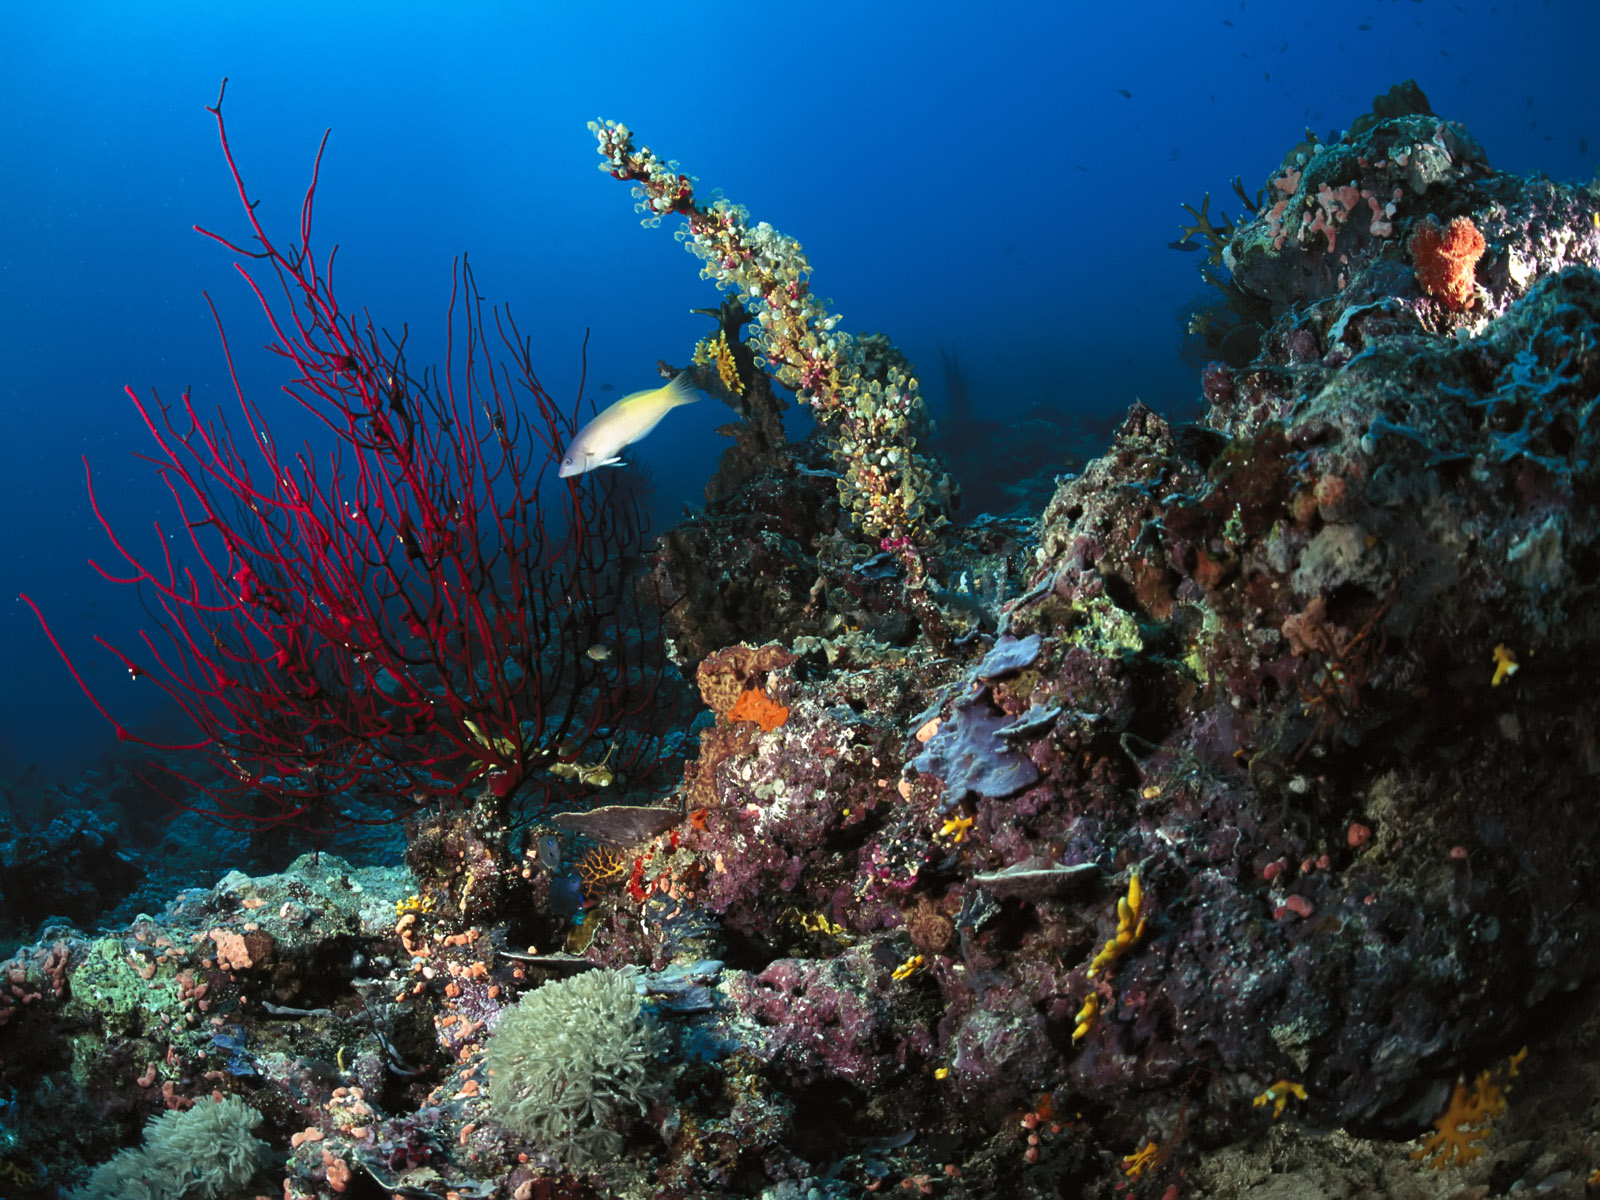 http://3.bp.blogspot.com/-BUzrQgE5YDA/Tb0o-T5Fx7I/AAAAAAAACEk/WDgSCL6bJG4/s1600/Underwater%2BWallpaper%2B%25252829%252529.jpg